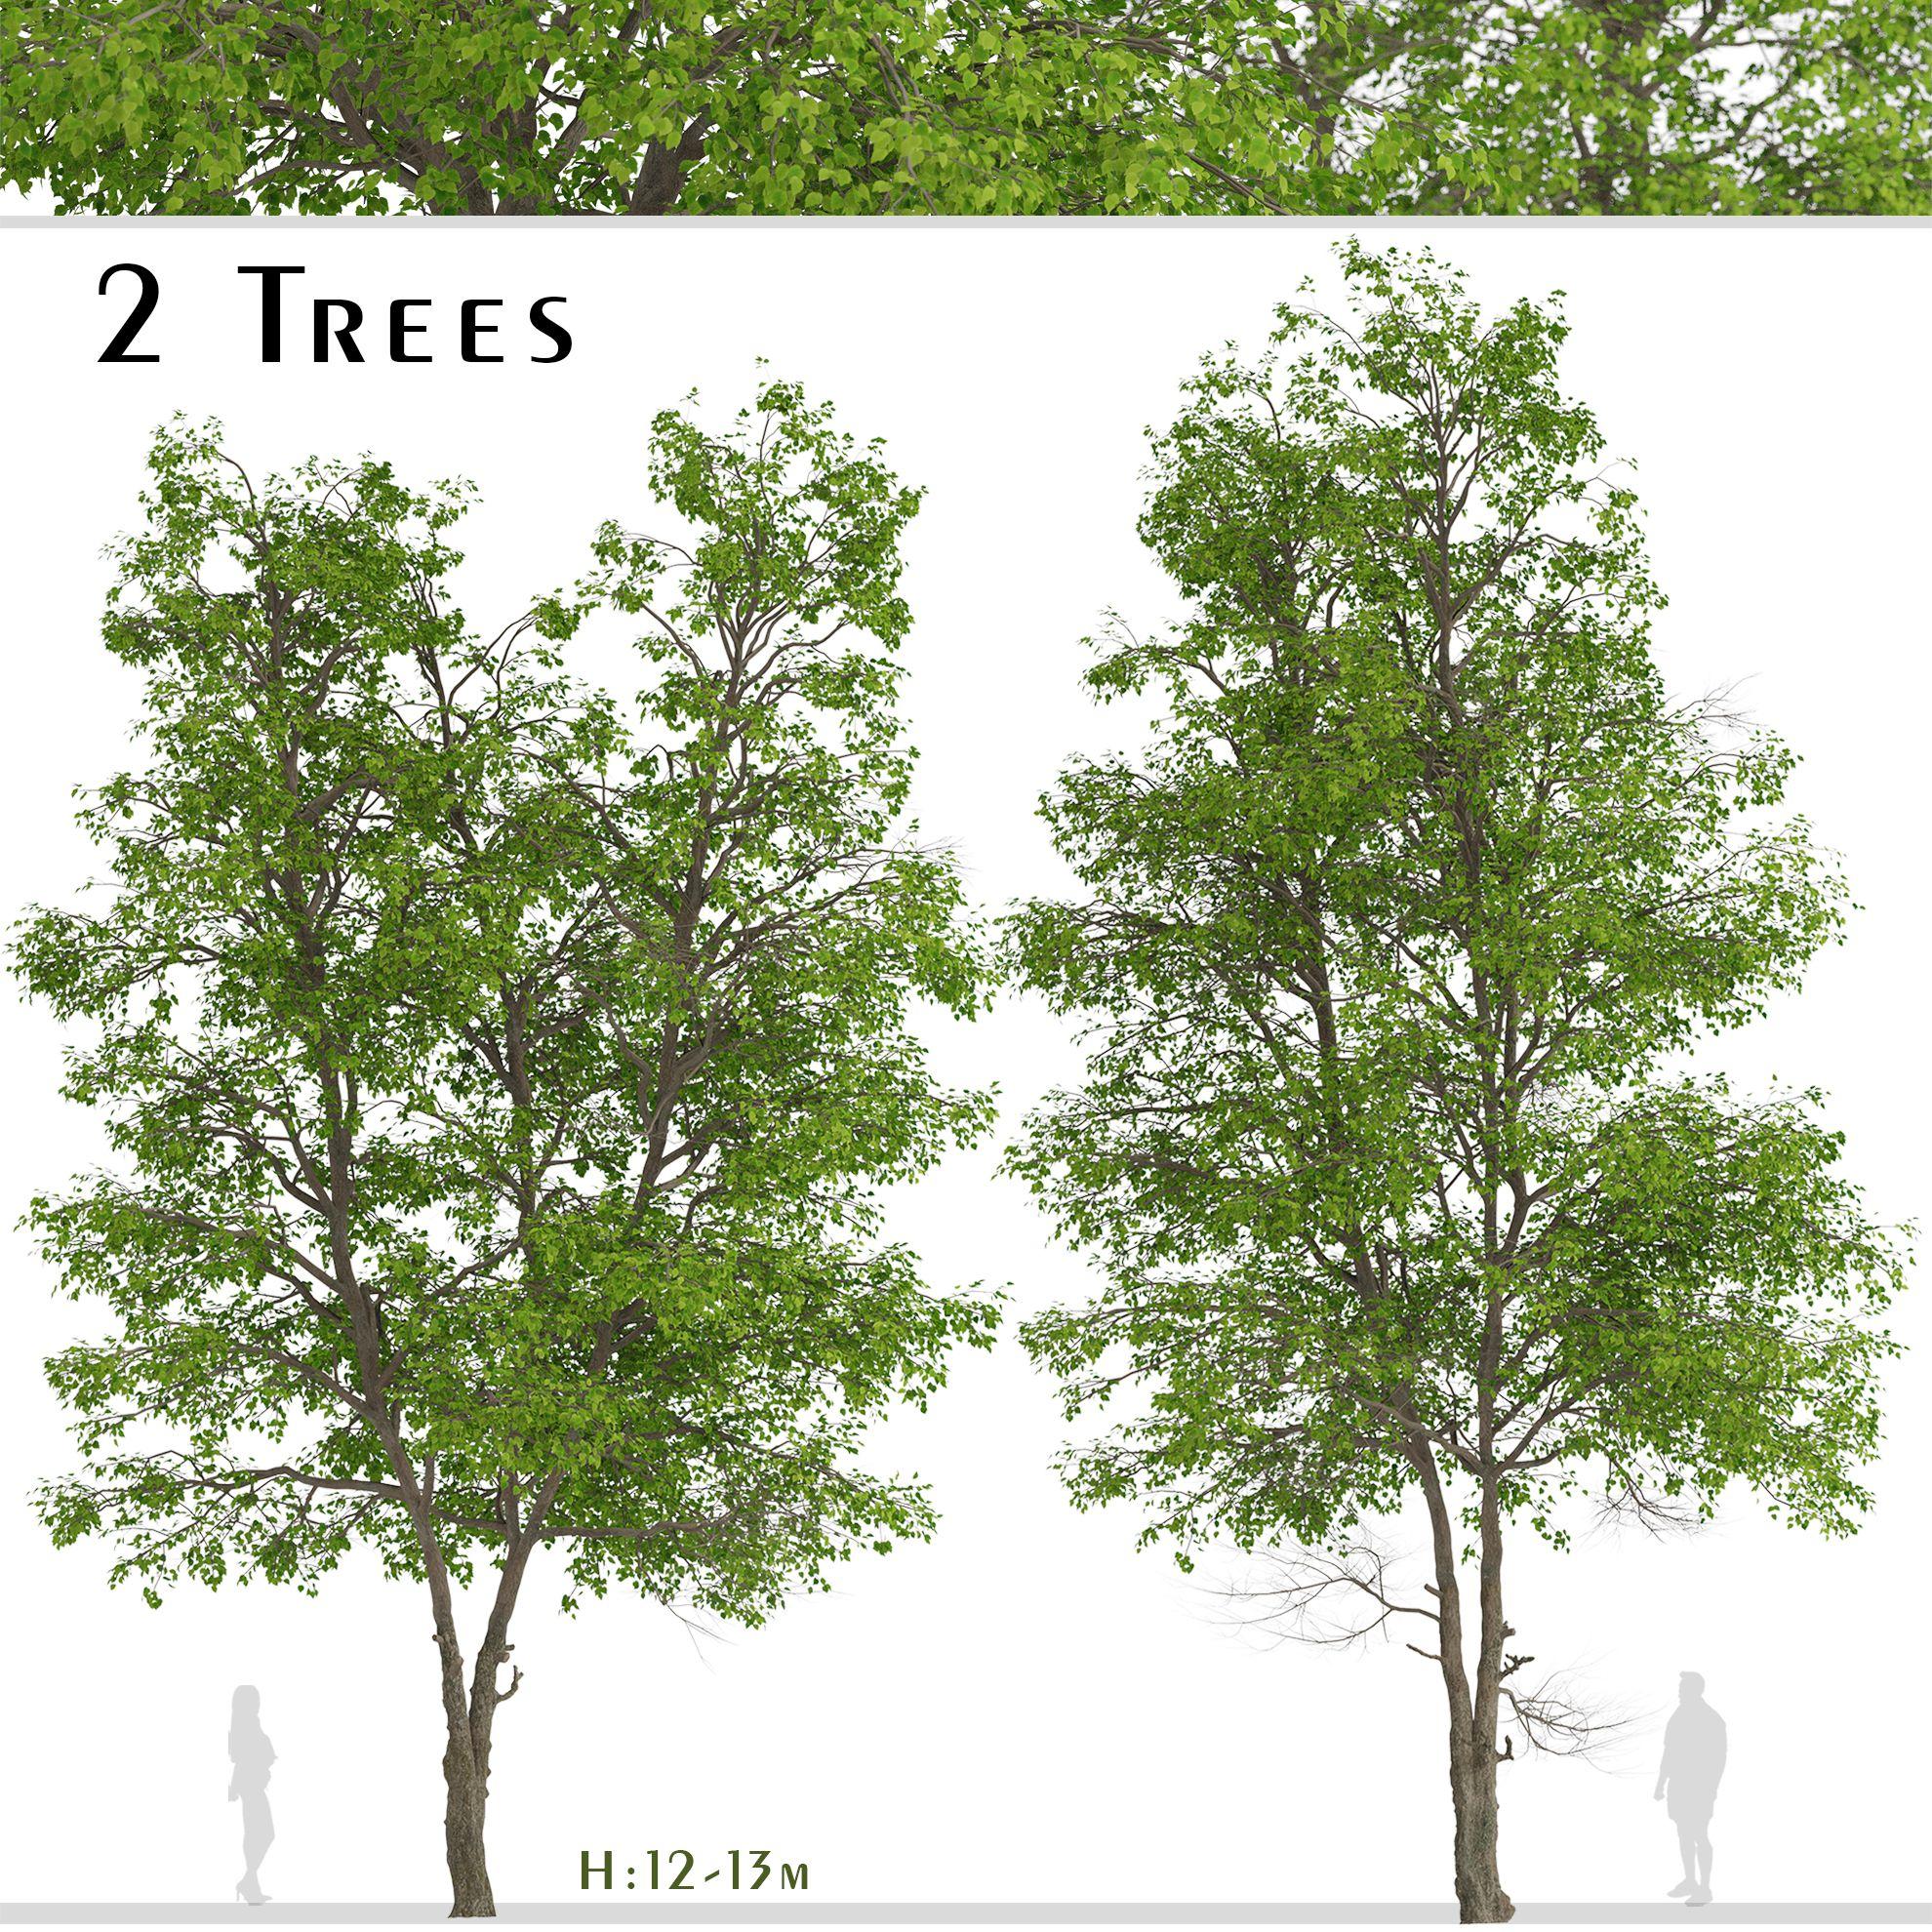 Set Of Tilia Platyphyllos Or Large Leaved Lime Trees 2 Trees 3d Model In 2021 3d Model Tree Lime Tree